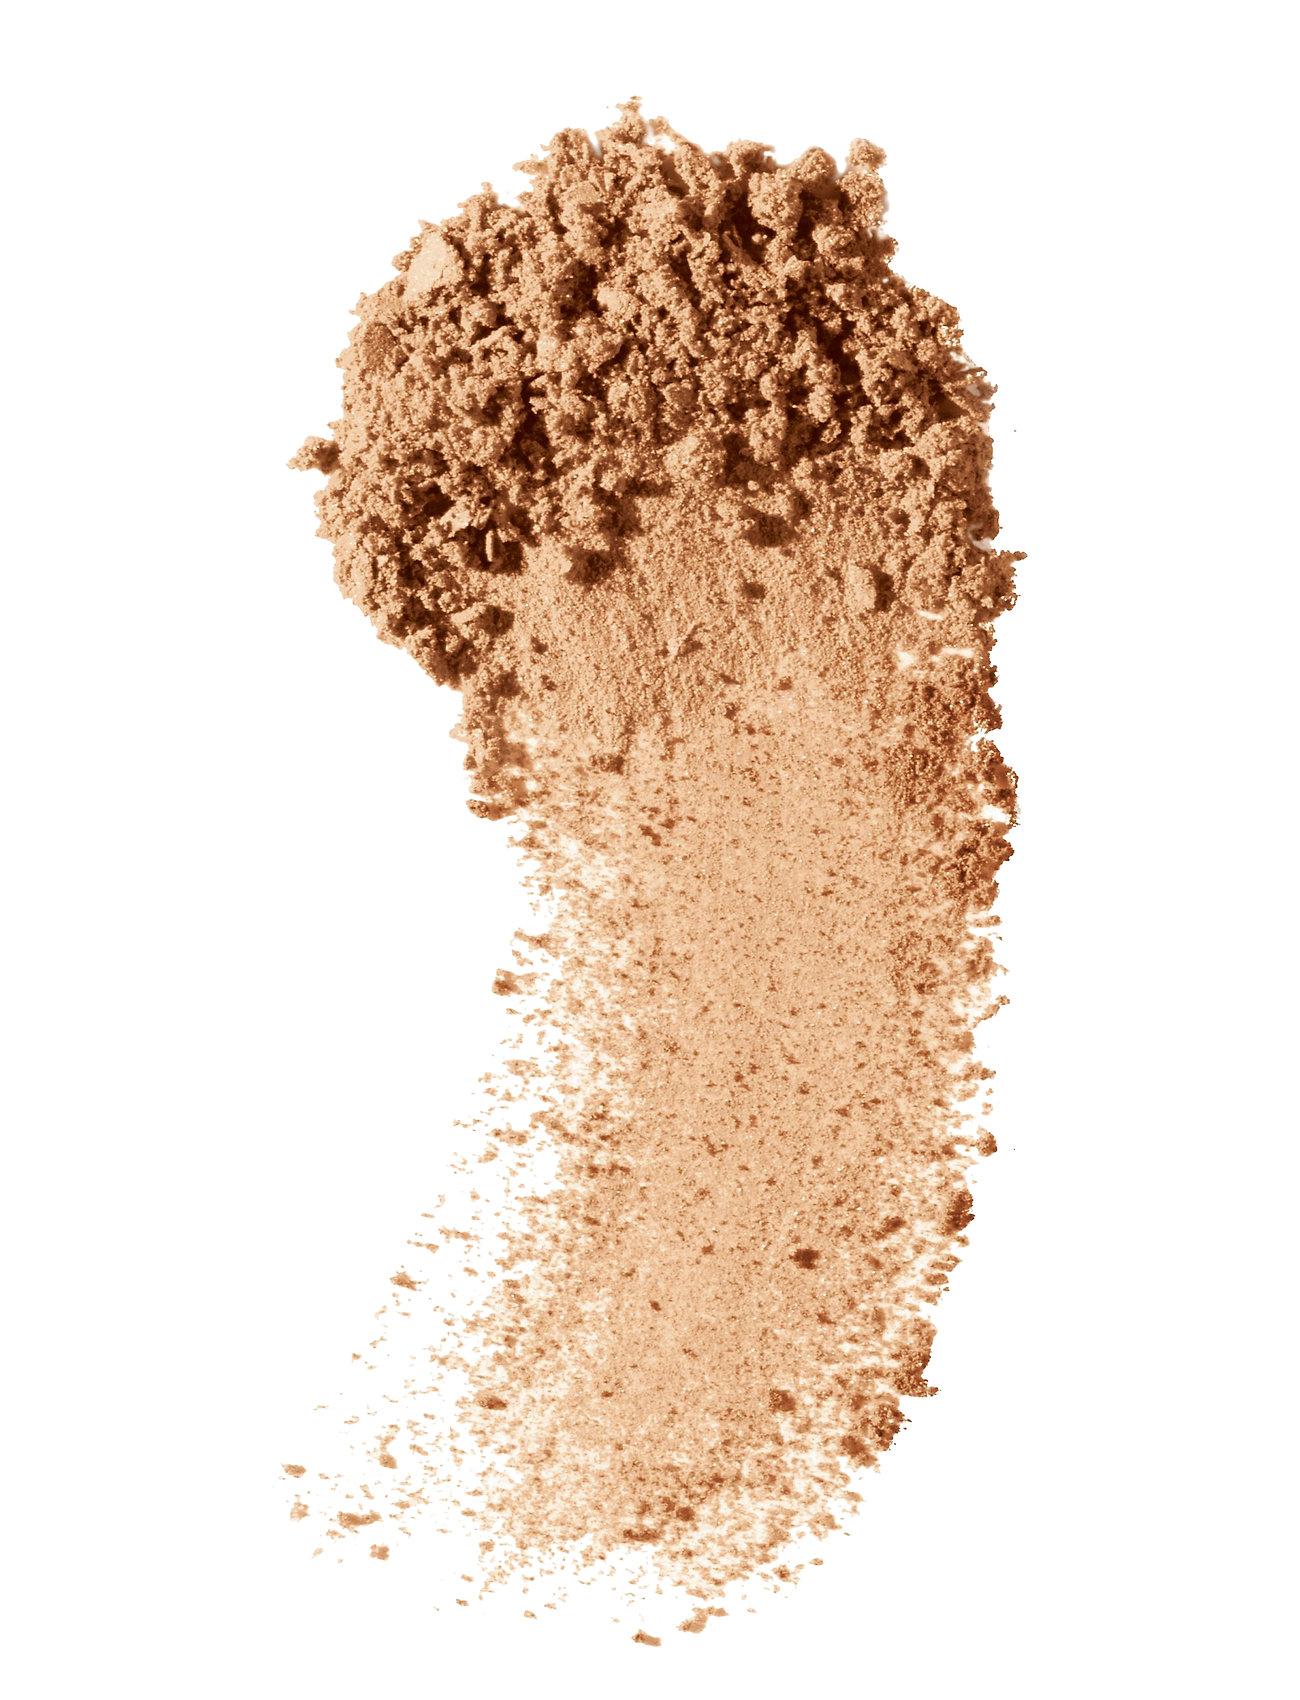 Image of Pure Finish Mineralfoundation 4 Pure Finish Pudder Makeup ELIZABETH ARDEN (3067500517)